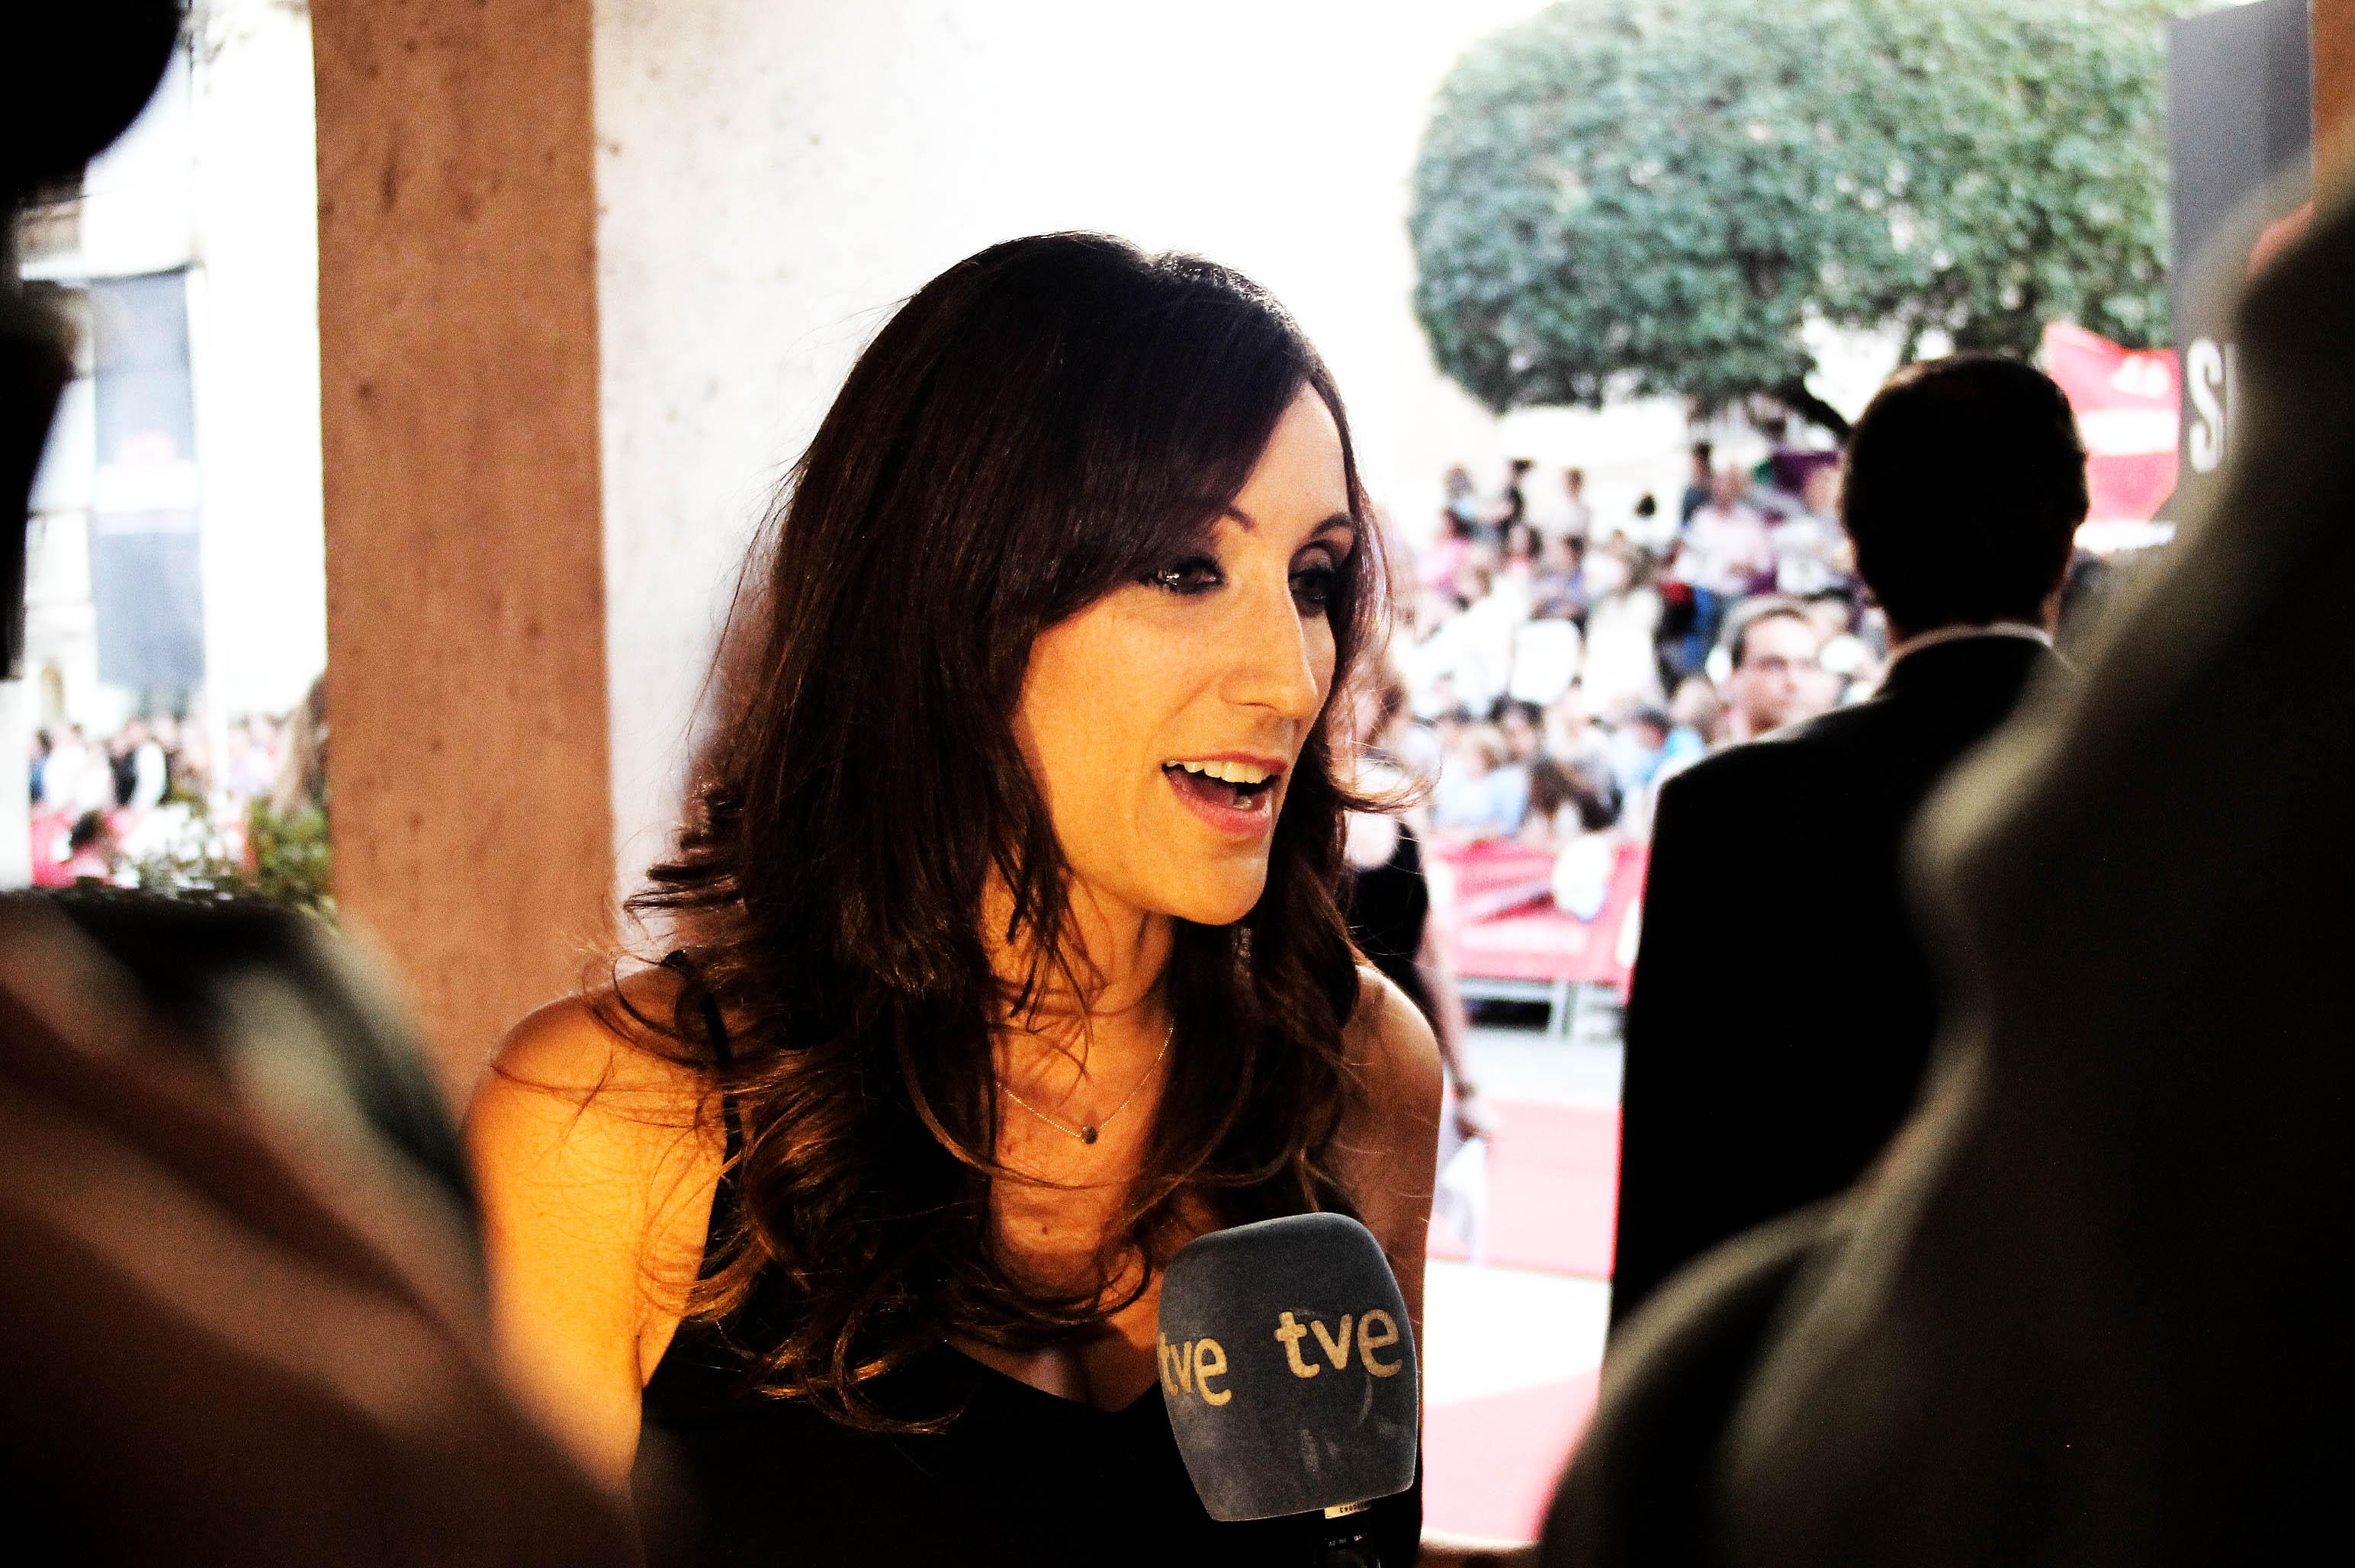 Anna Simon Culo ana morgade: spanish actor, presenter and television